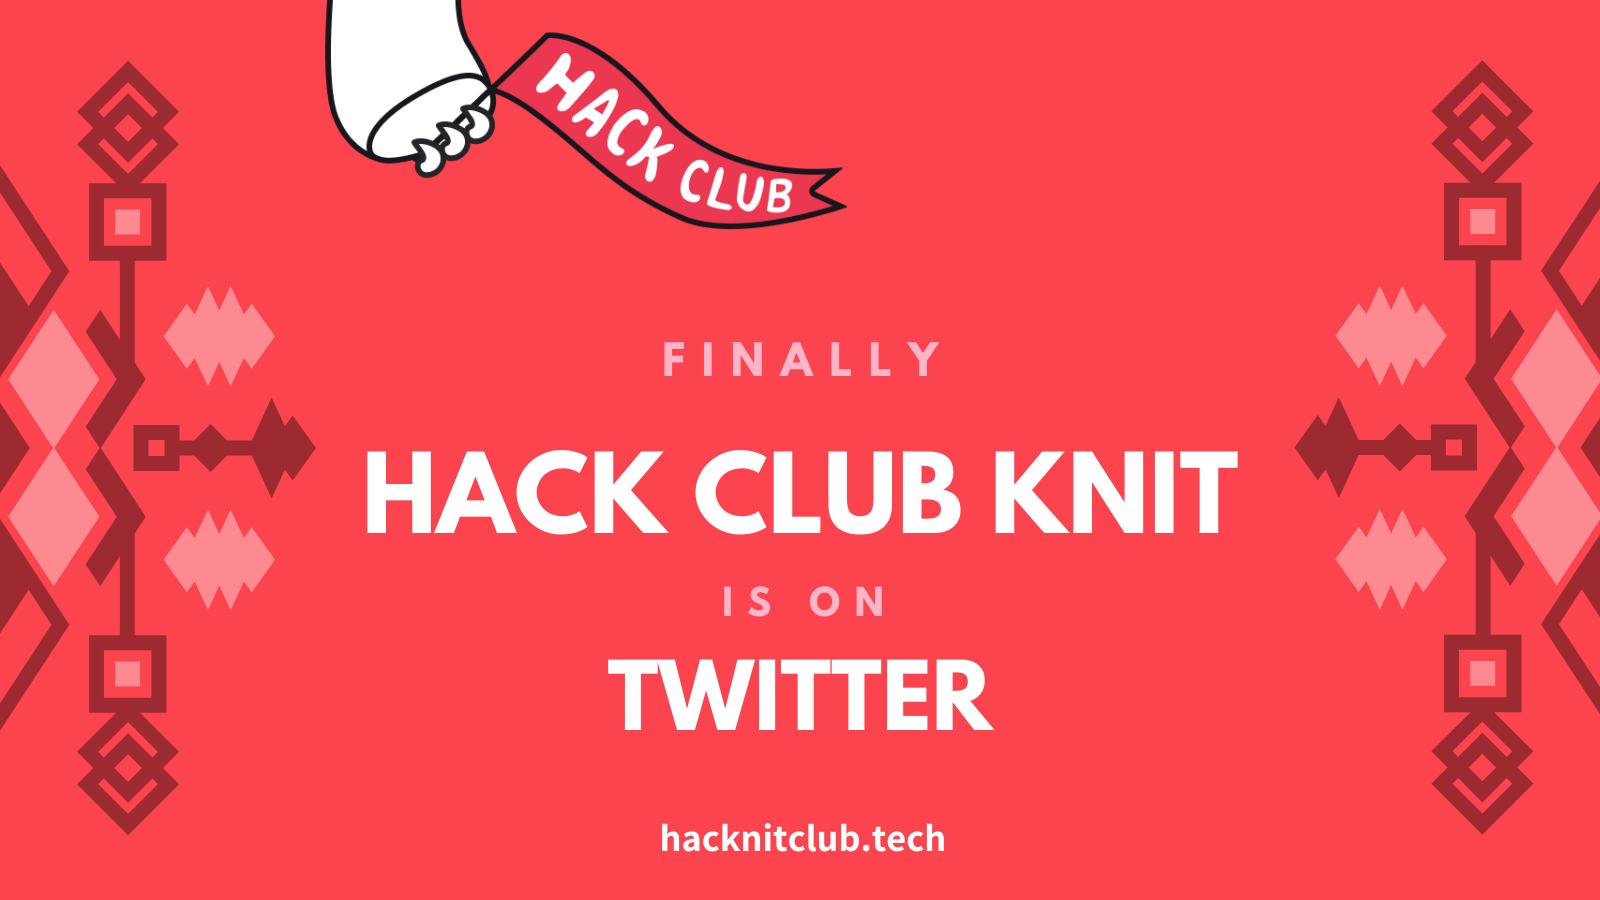 https://cloud-18522qpqv-hack-club-bot.vercel.app/00001-1661006832_20210521_122650_0000.png